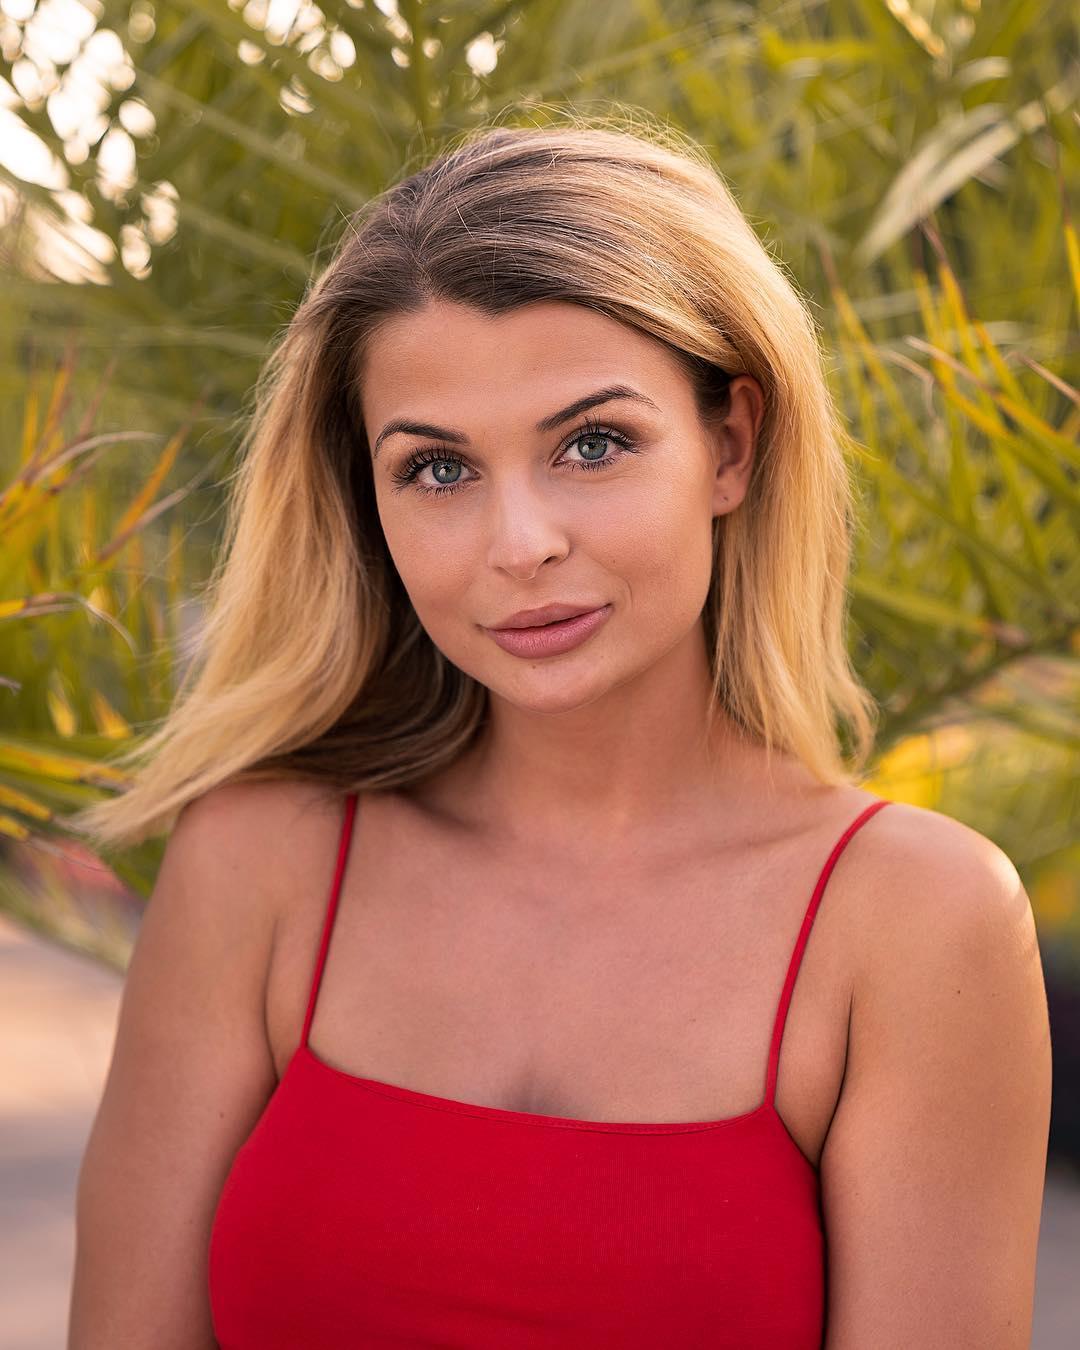 Lisa Gelbrich, alias Lisa Del Piero